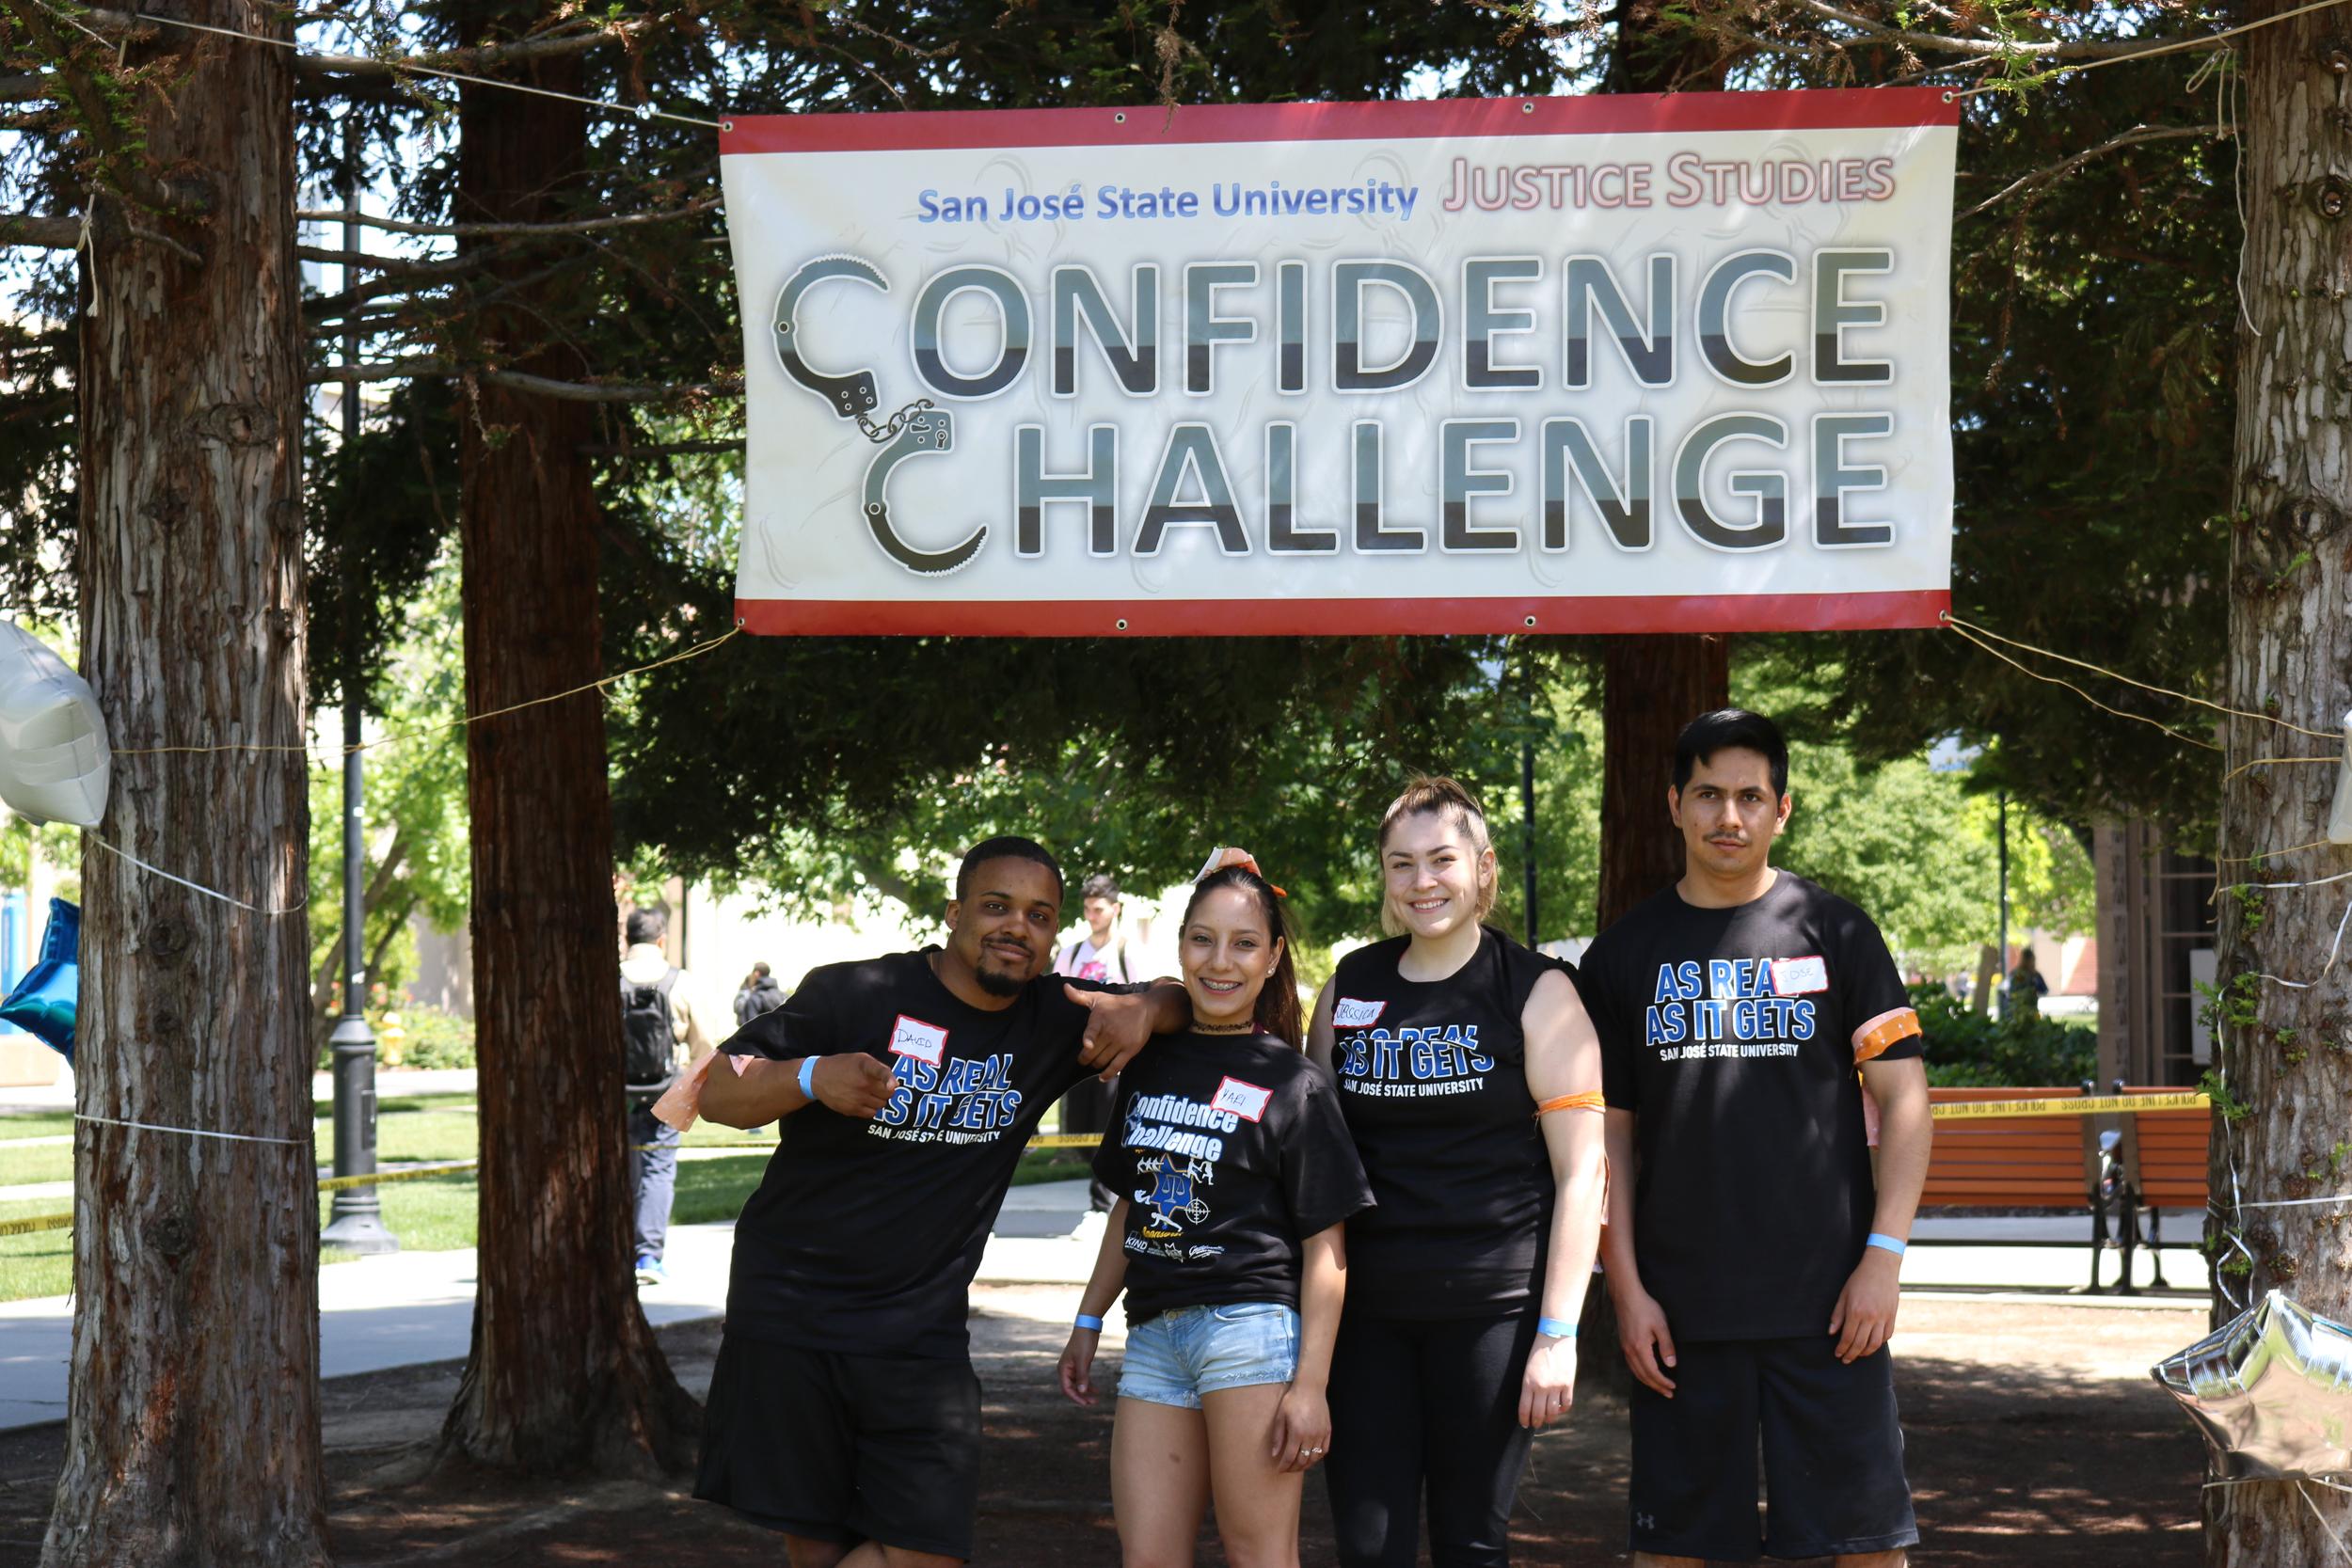 042817_Confidence_Challenge_Kameda-4.jpg